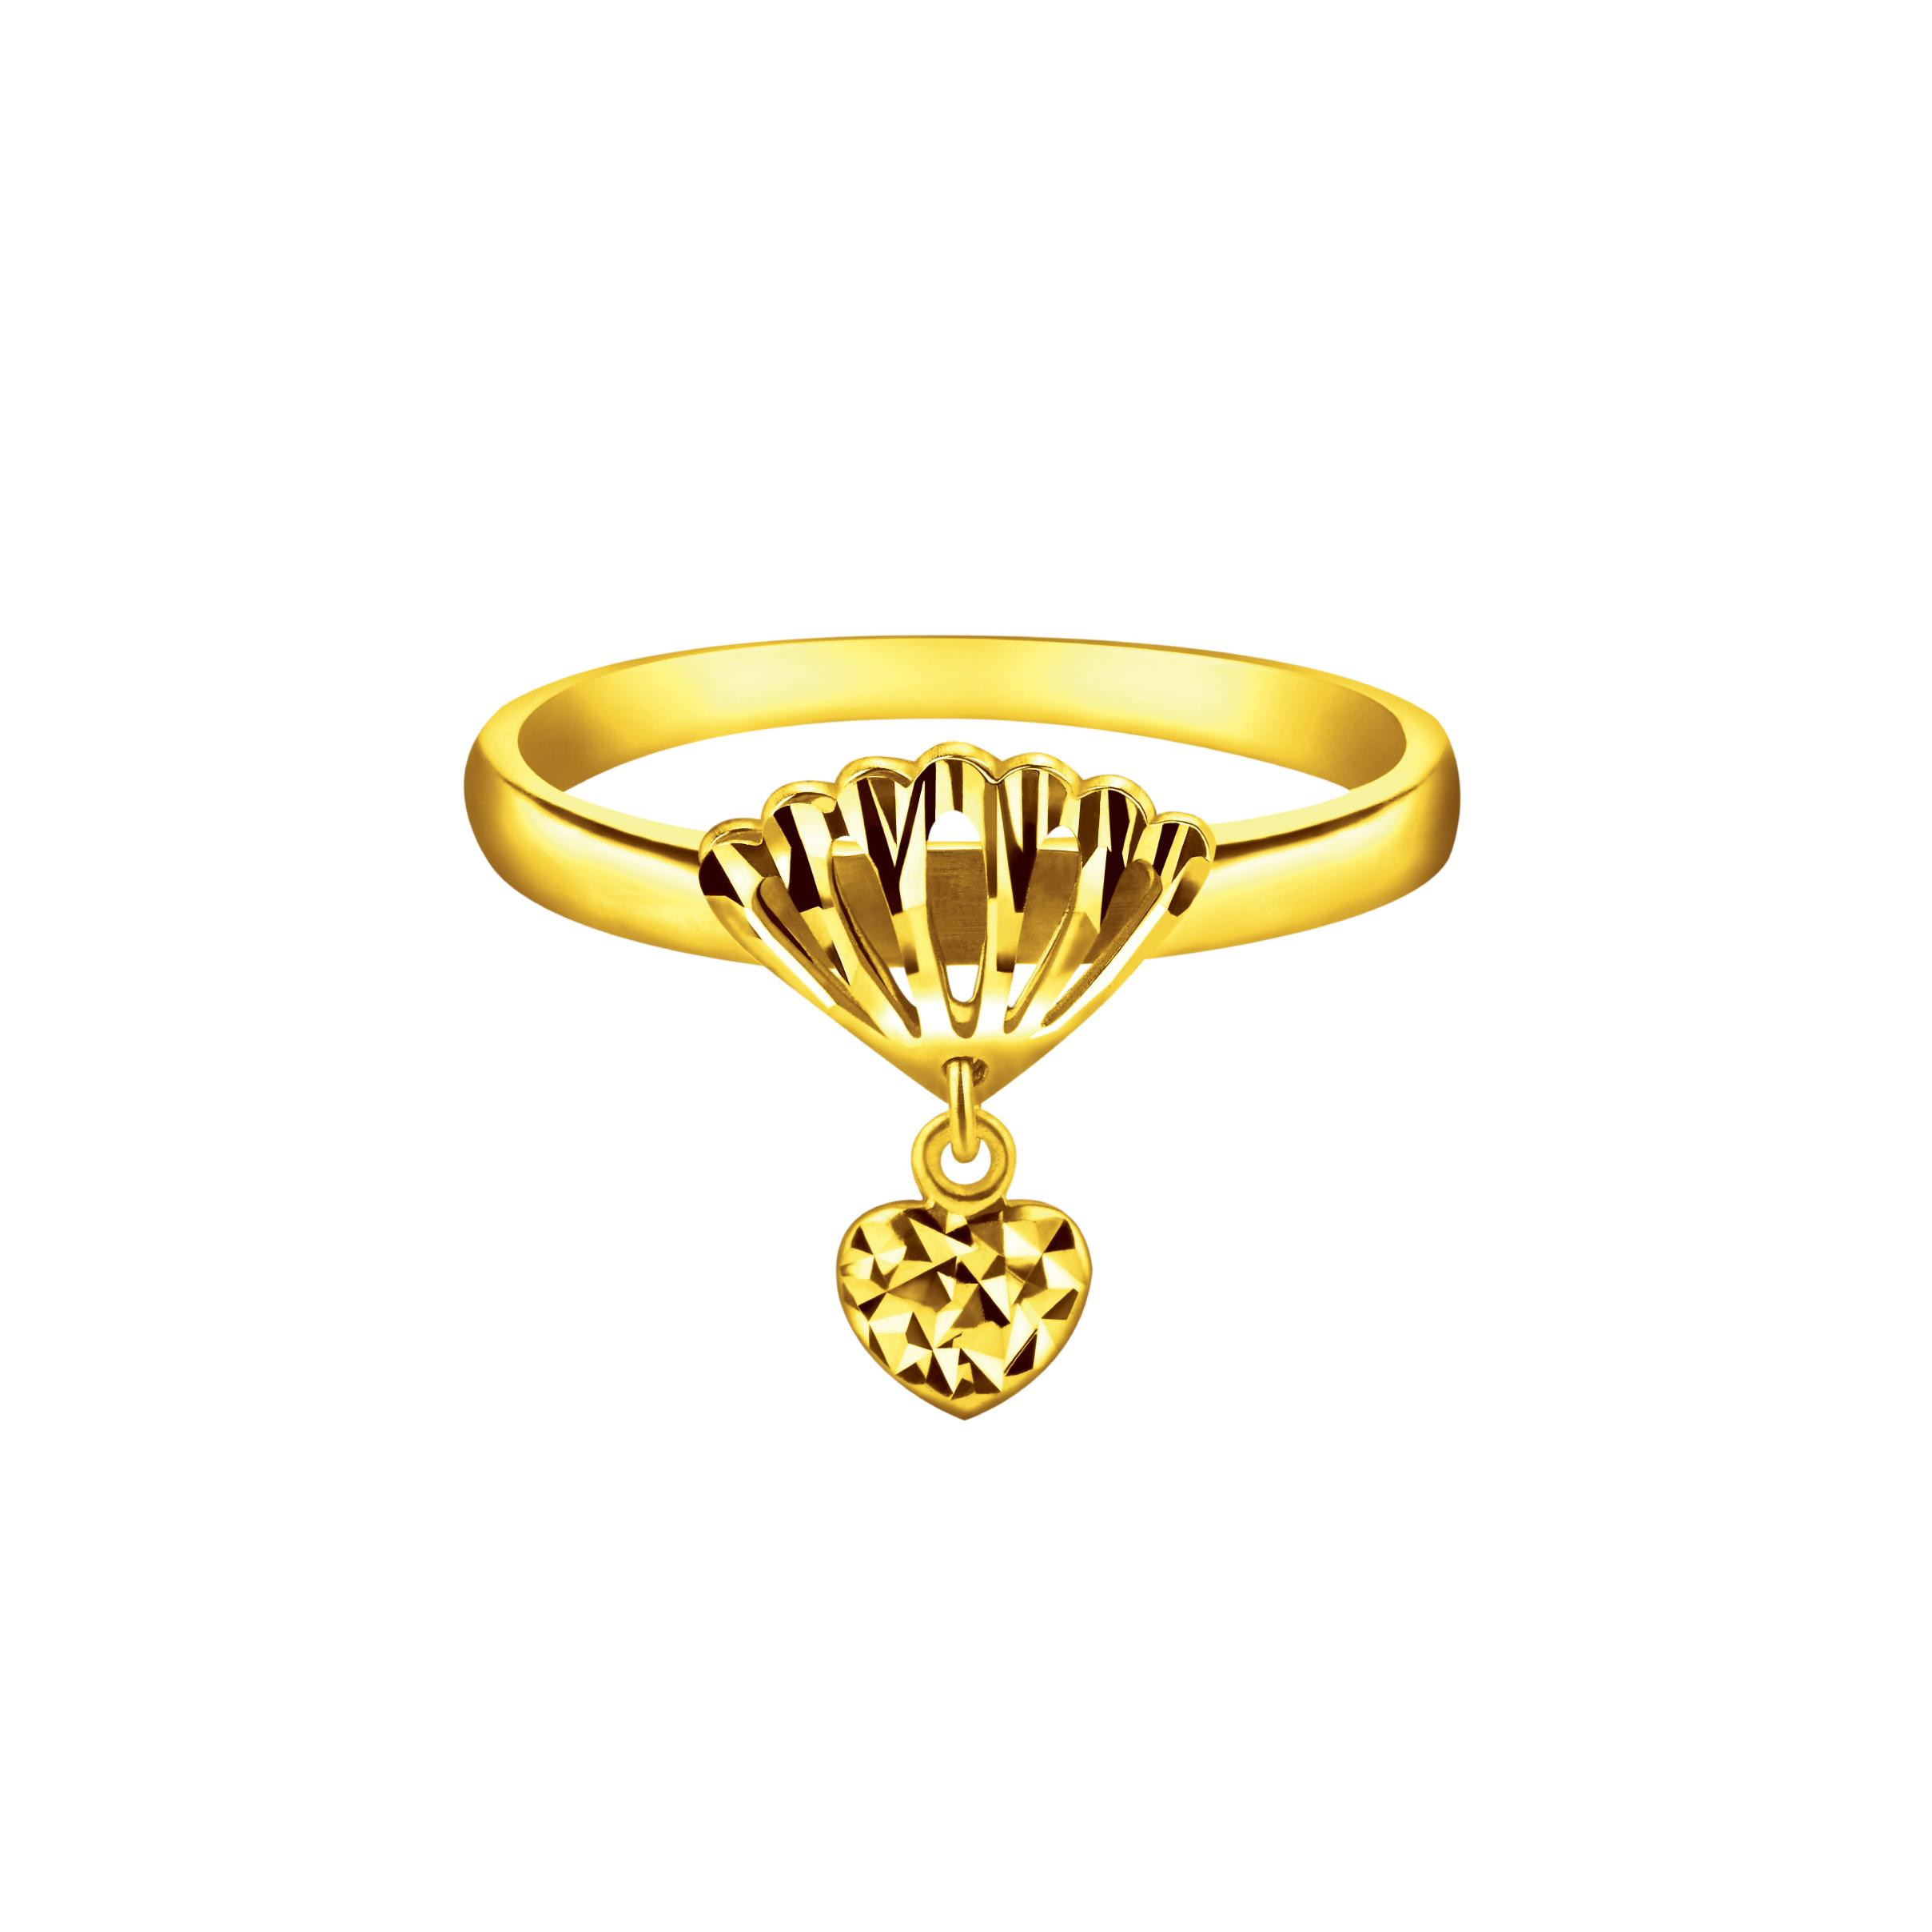 Goldstyle「贝.爱」戒指